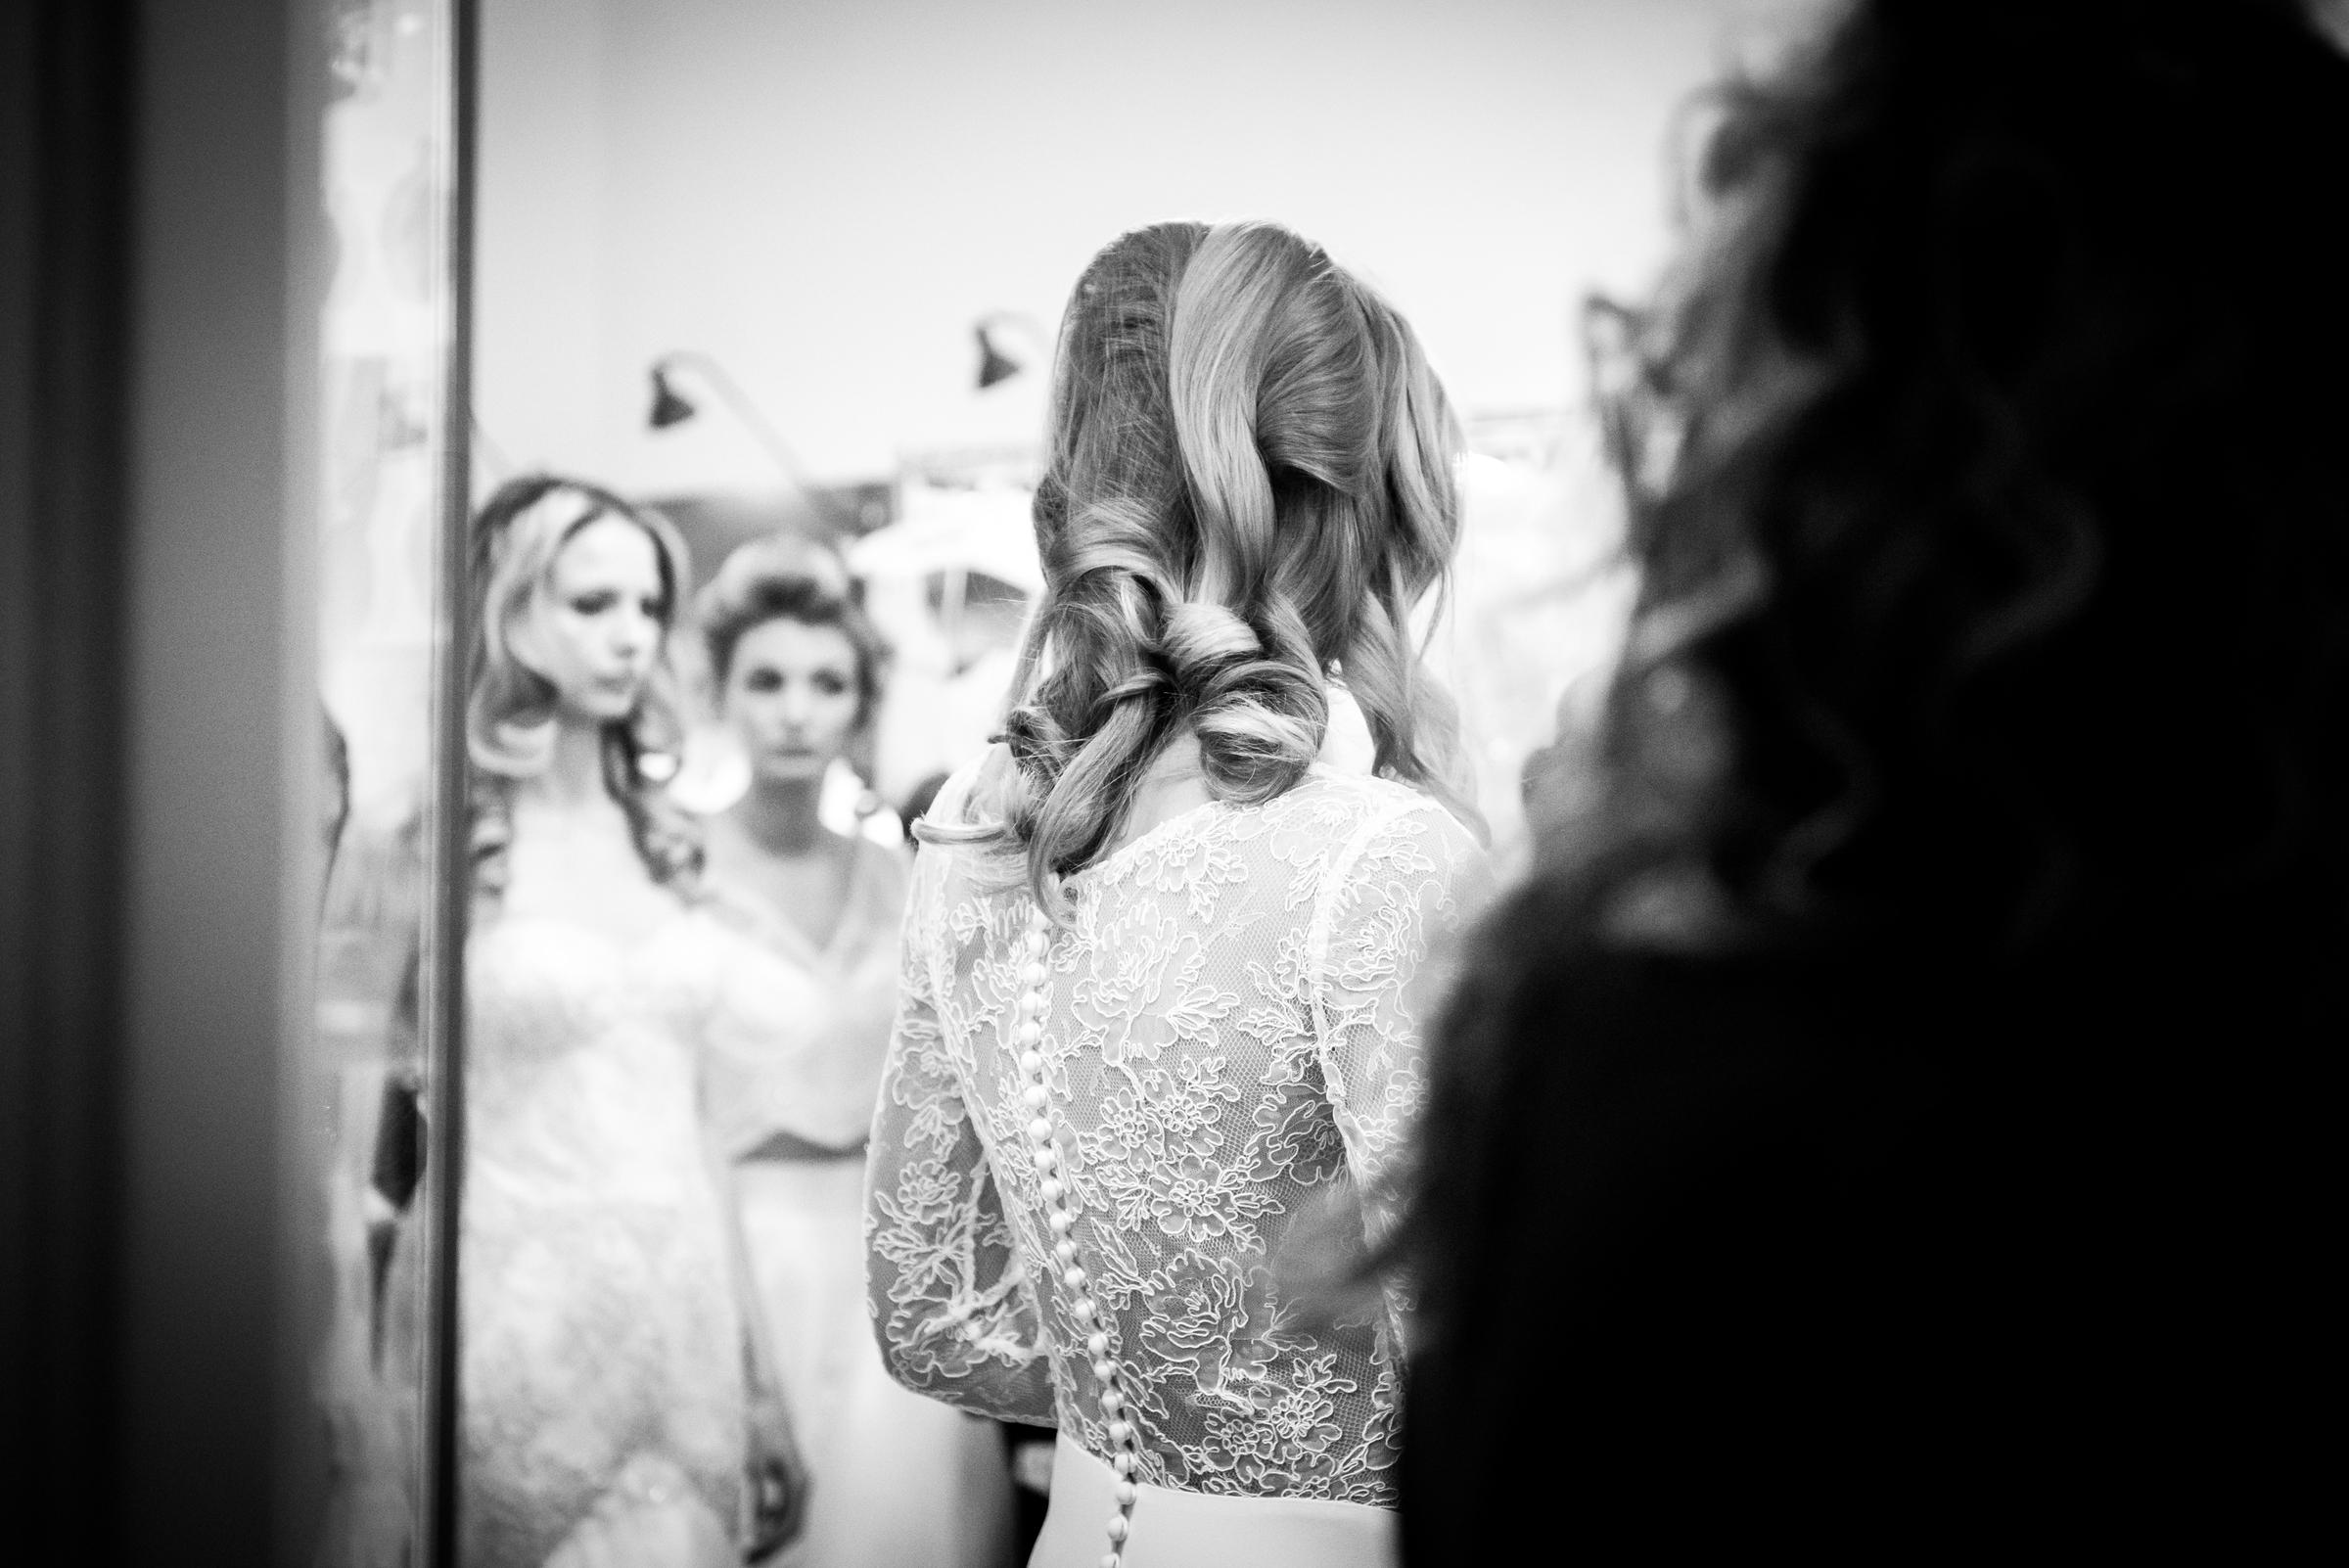 Portrait Collection - Candid shots - Juliet Mckee Photography-196